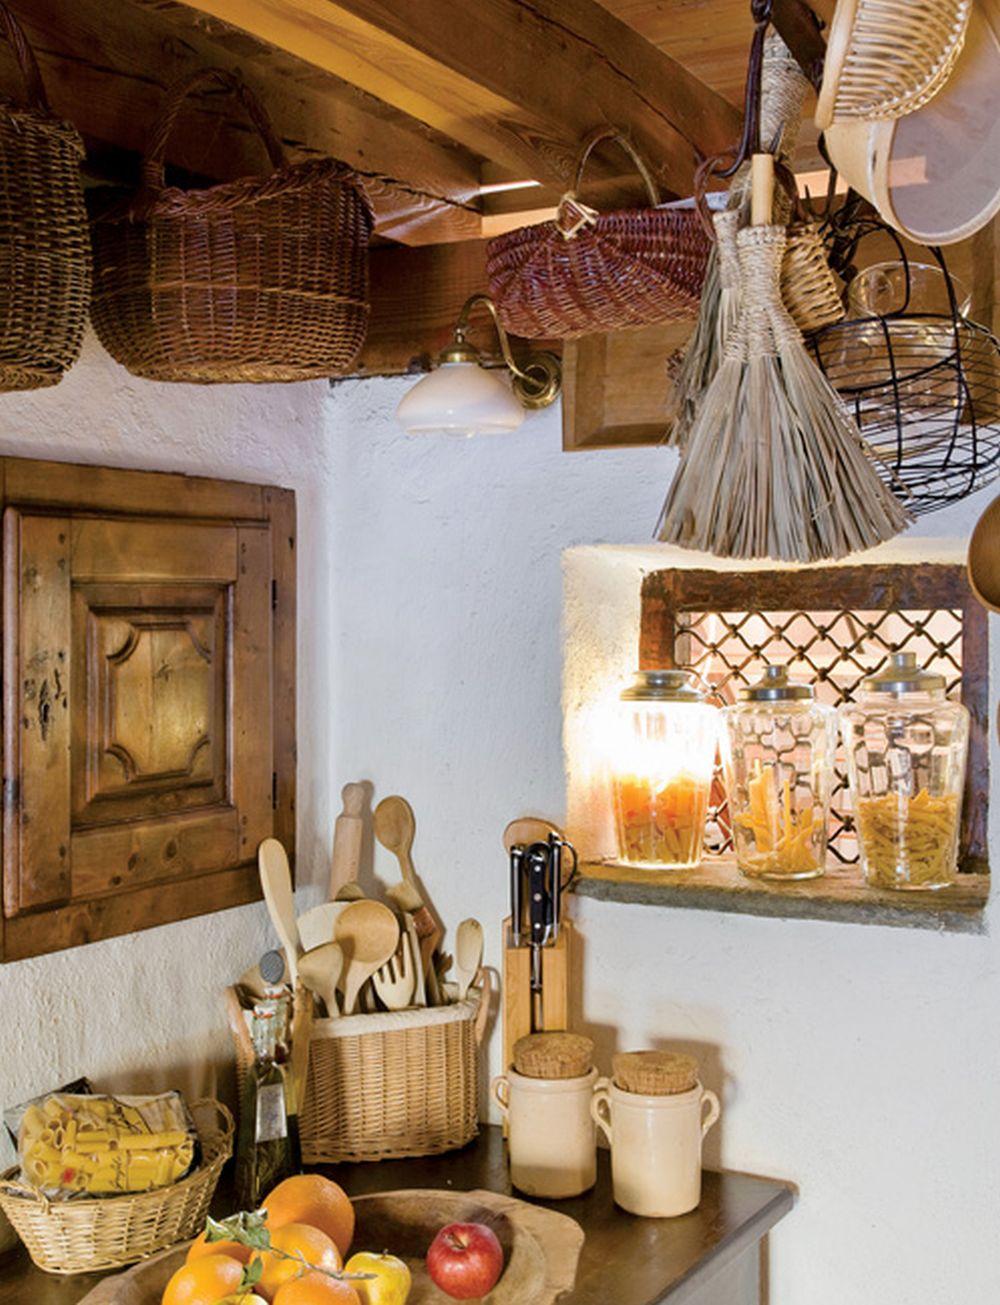 adelaparvu.com hambar piatra transformat in casa Foto Cristina Fiorentini,Gap Interiors (9)